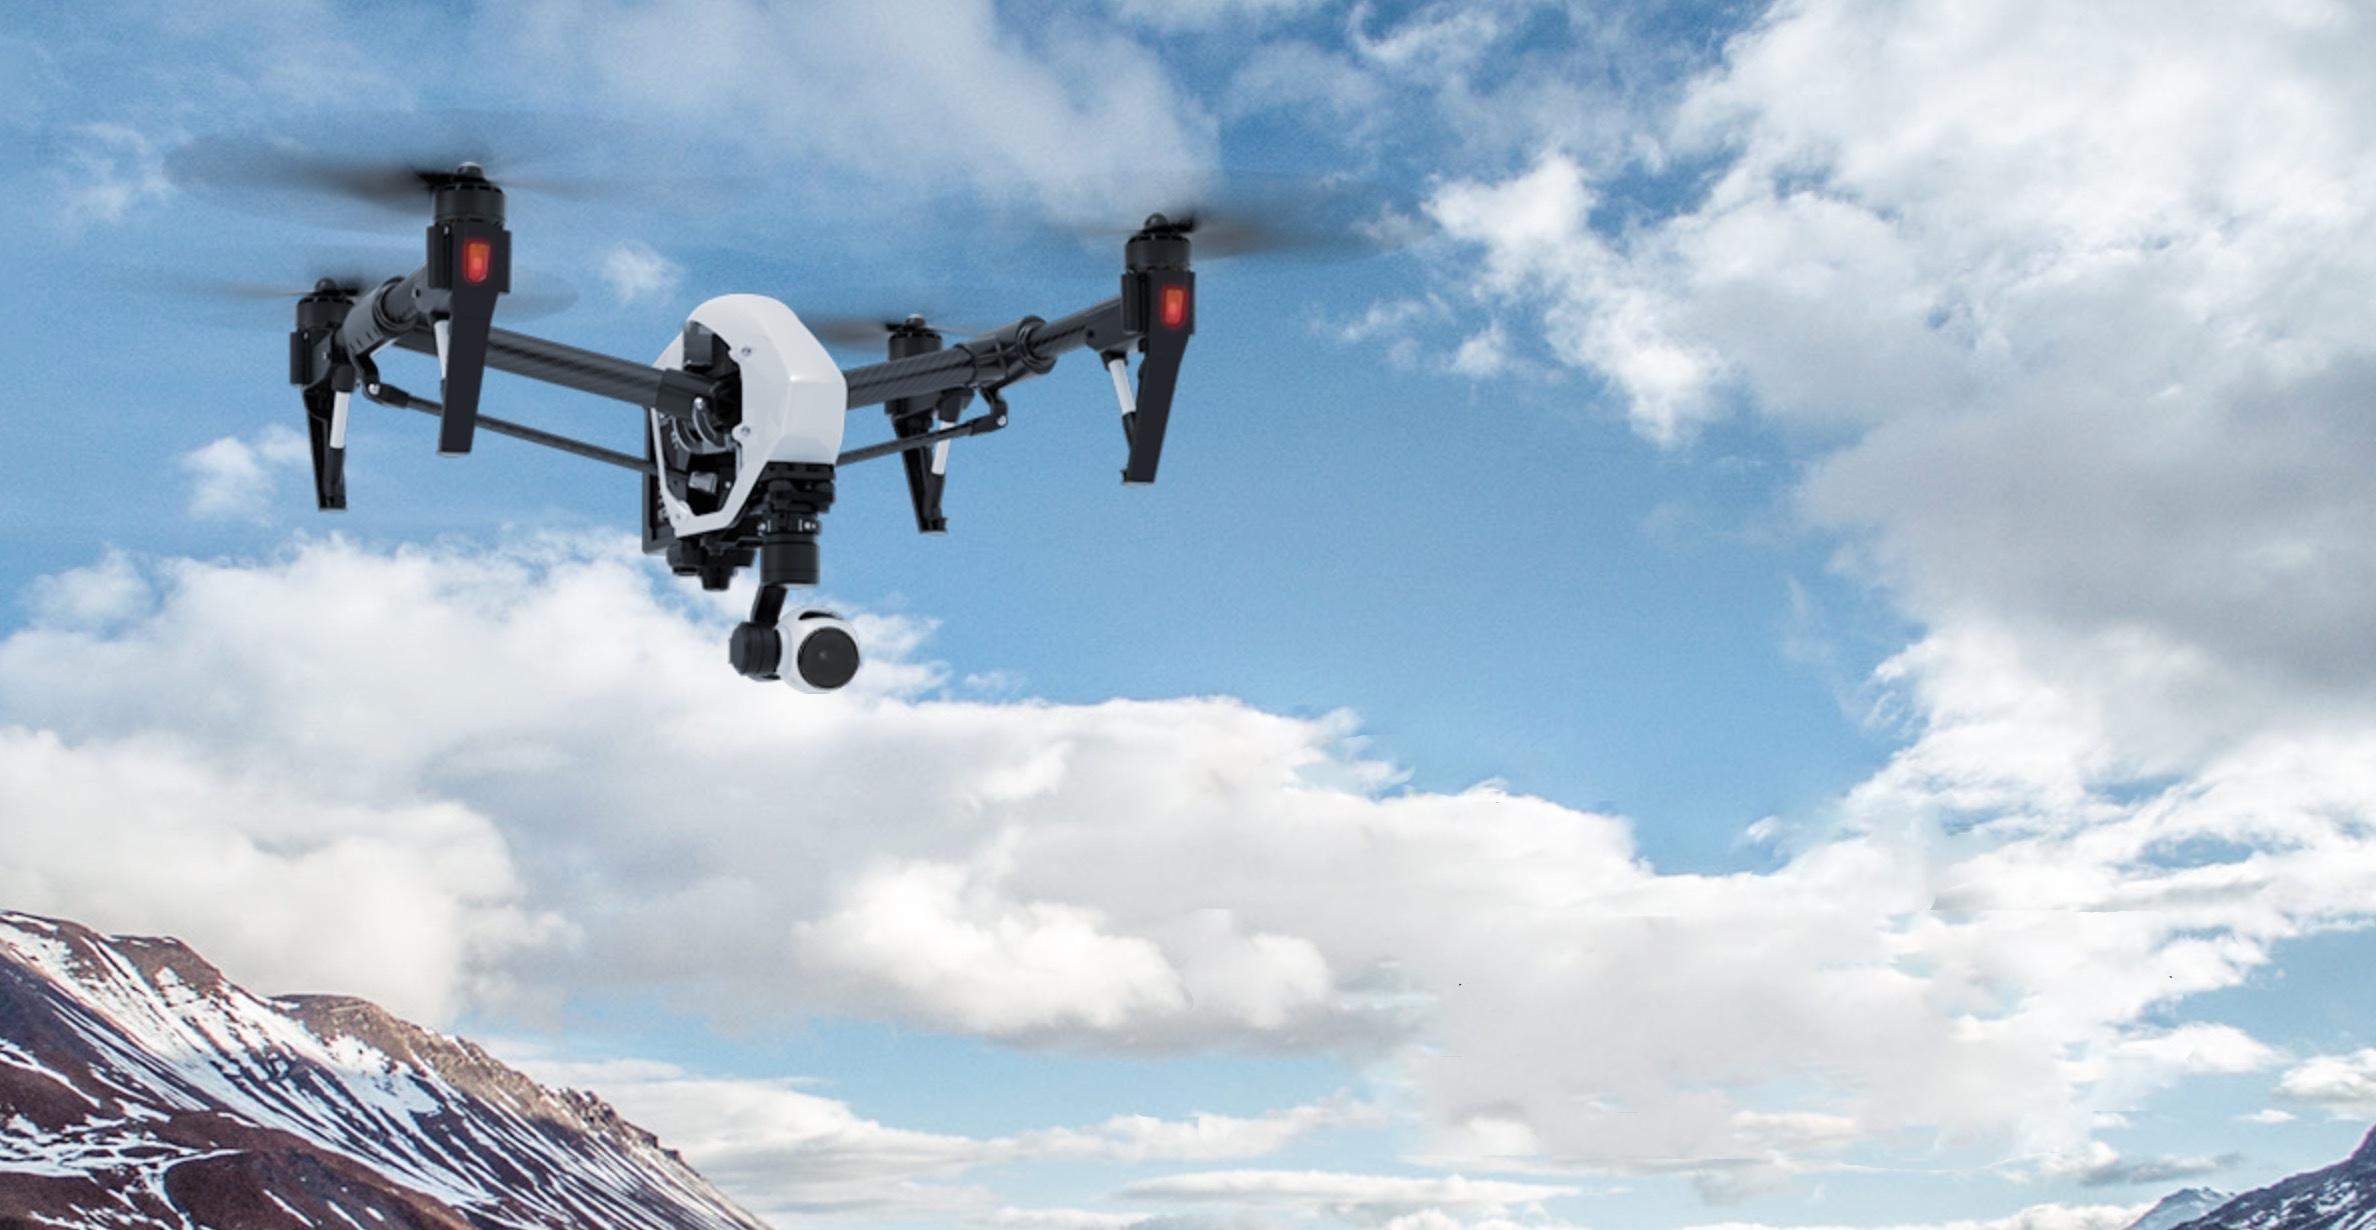 DJI giới thiệu Insprire 1 – Camera bay giá 2,899$